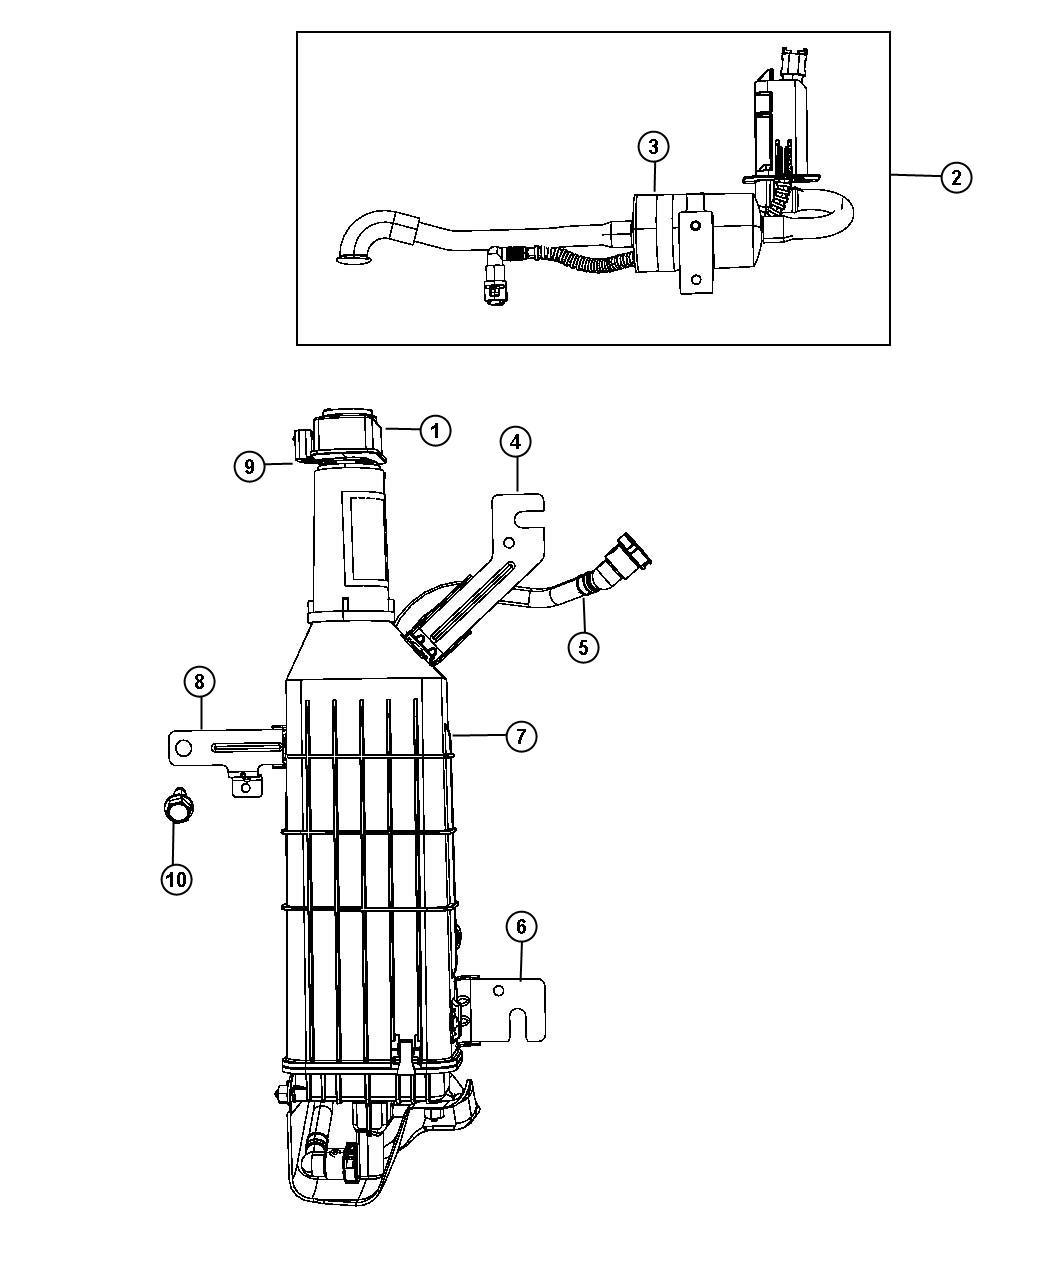 Dodge Grand Caravan Filter  Fuel Vapor Vent  Dectection